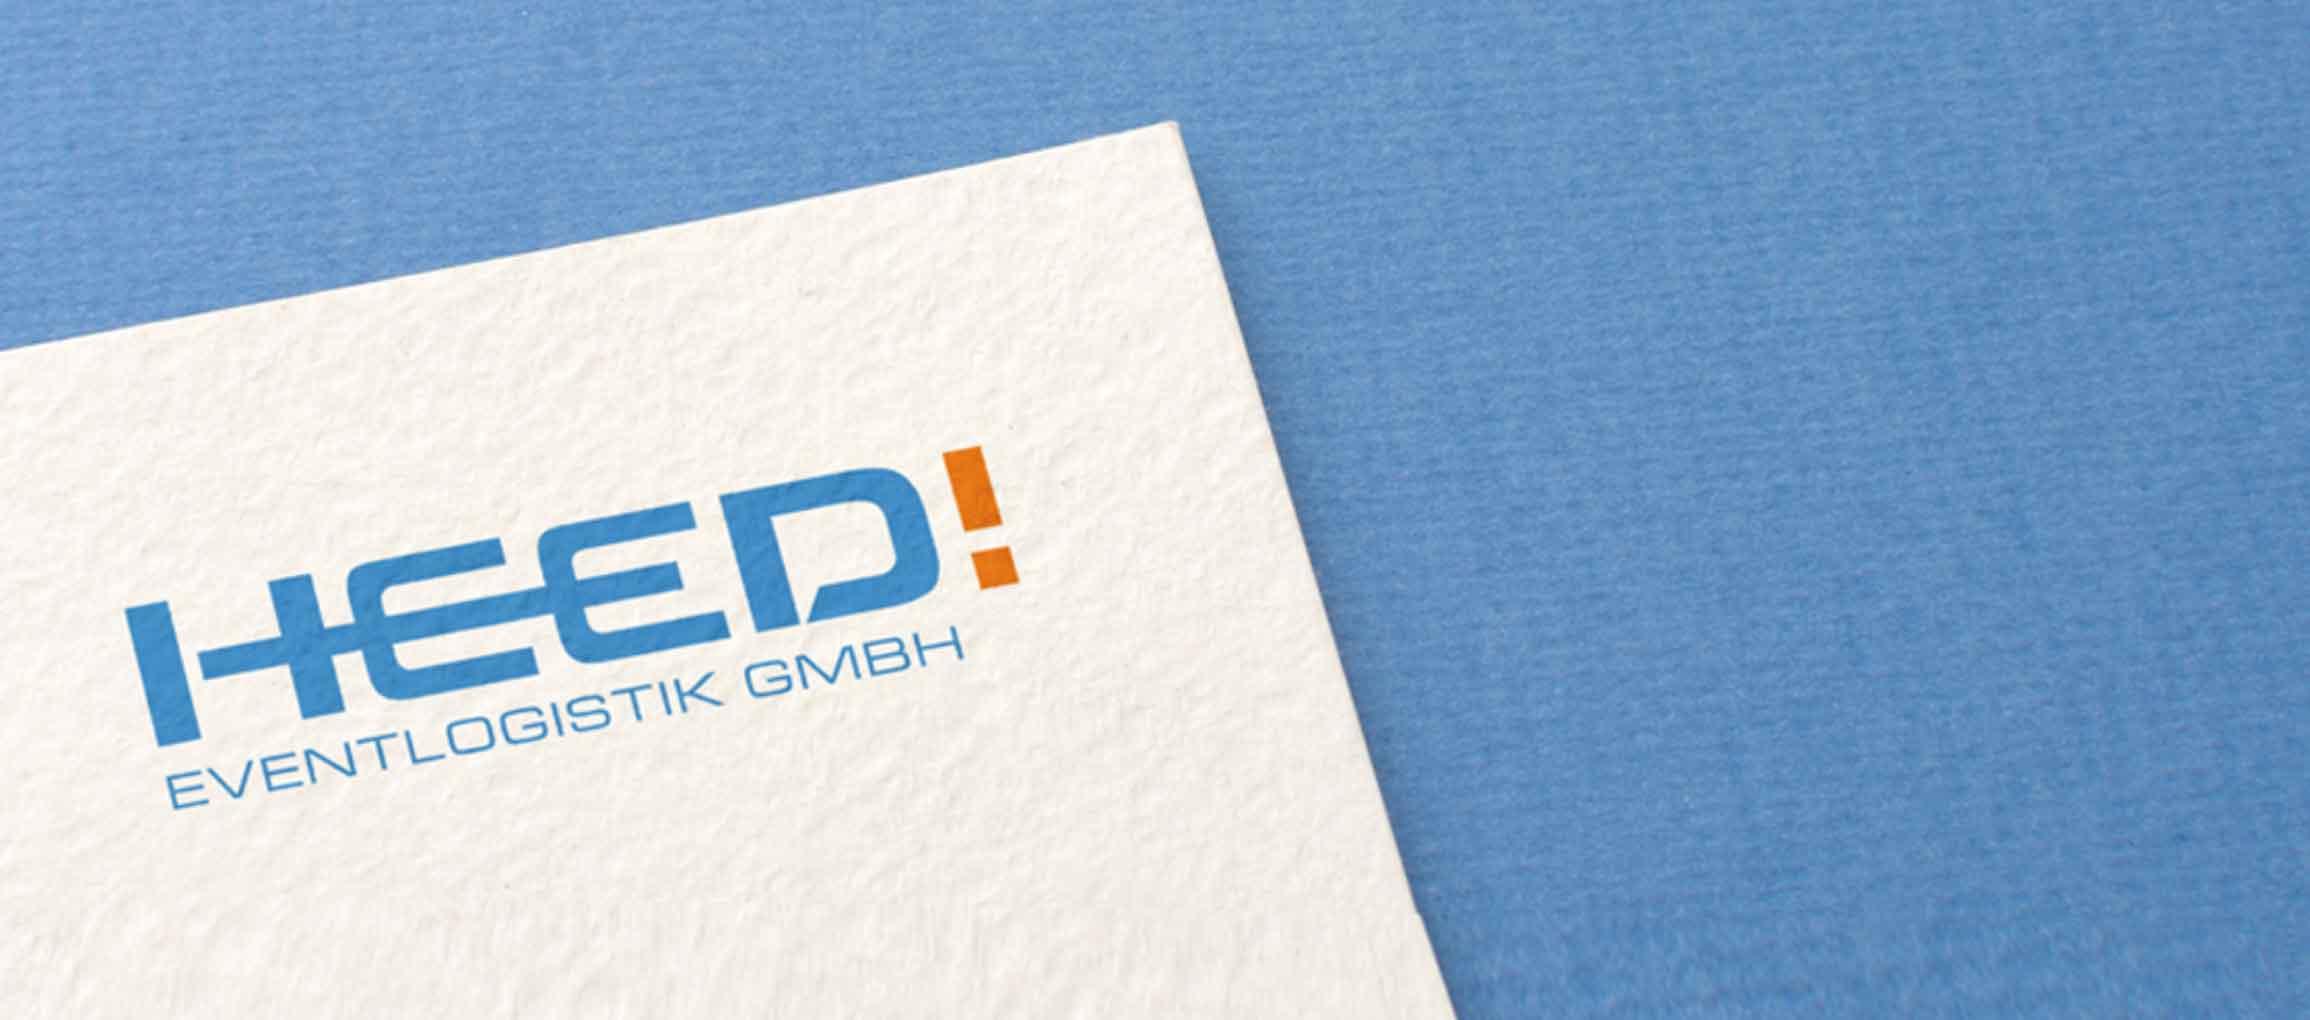 HEED! Eventlogistik: Corporate Design Entwicklung